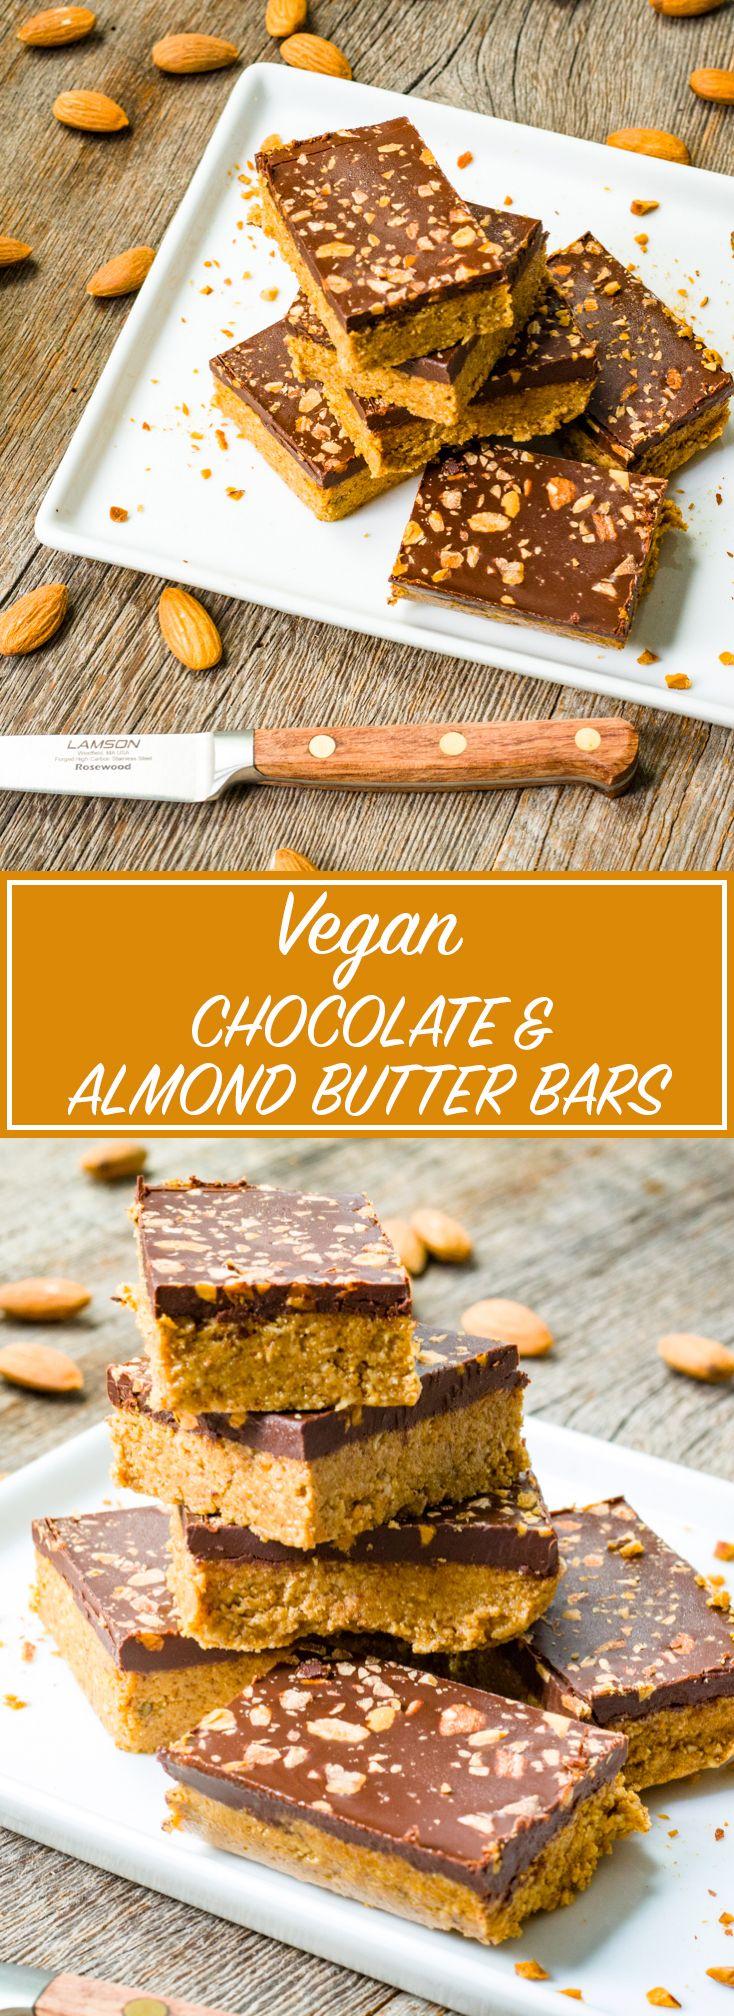 Vegan, Paleo, Chocolate, Almond Butter, Oats, Dessert, Snack, Quick, Easy